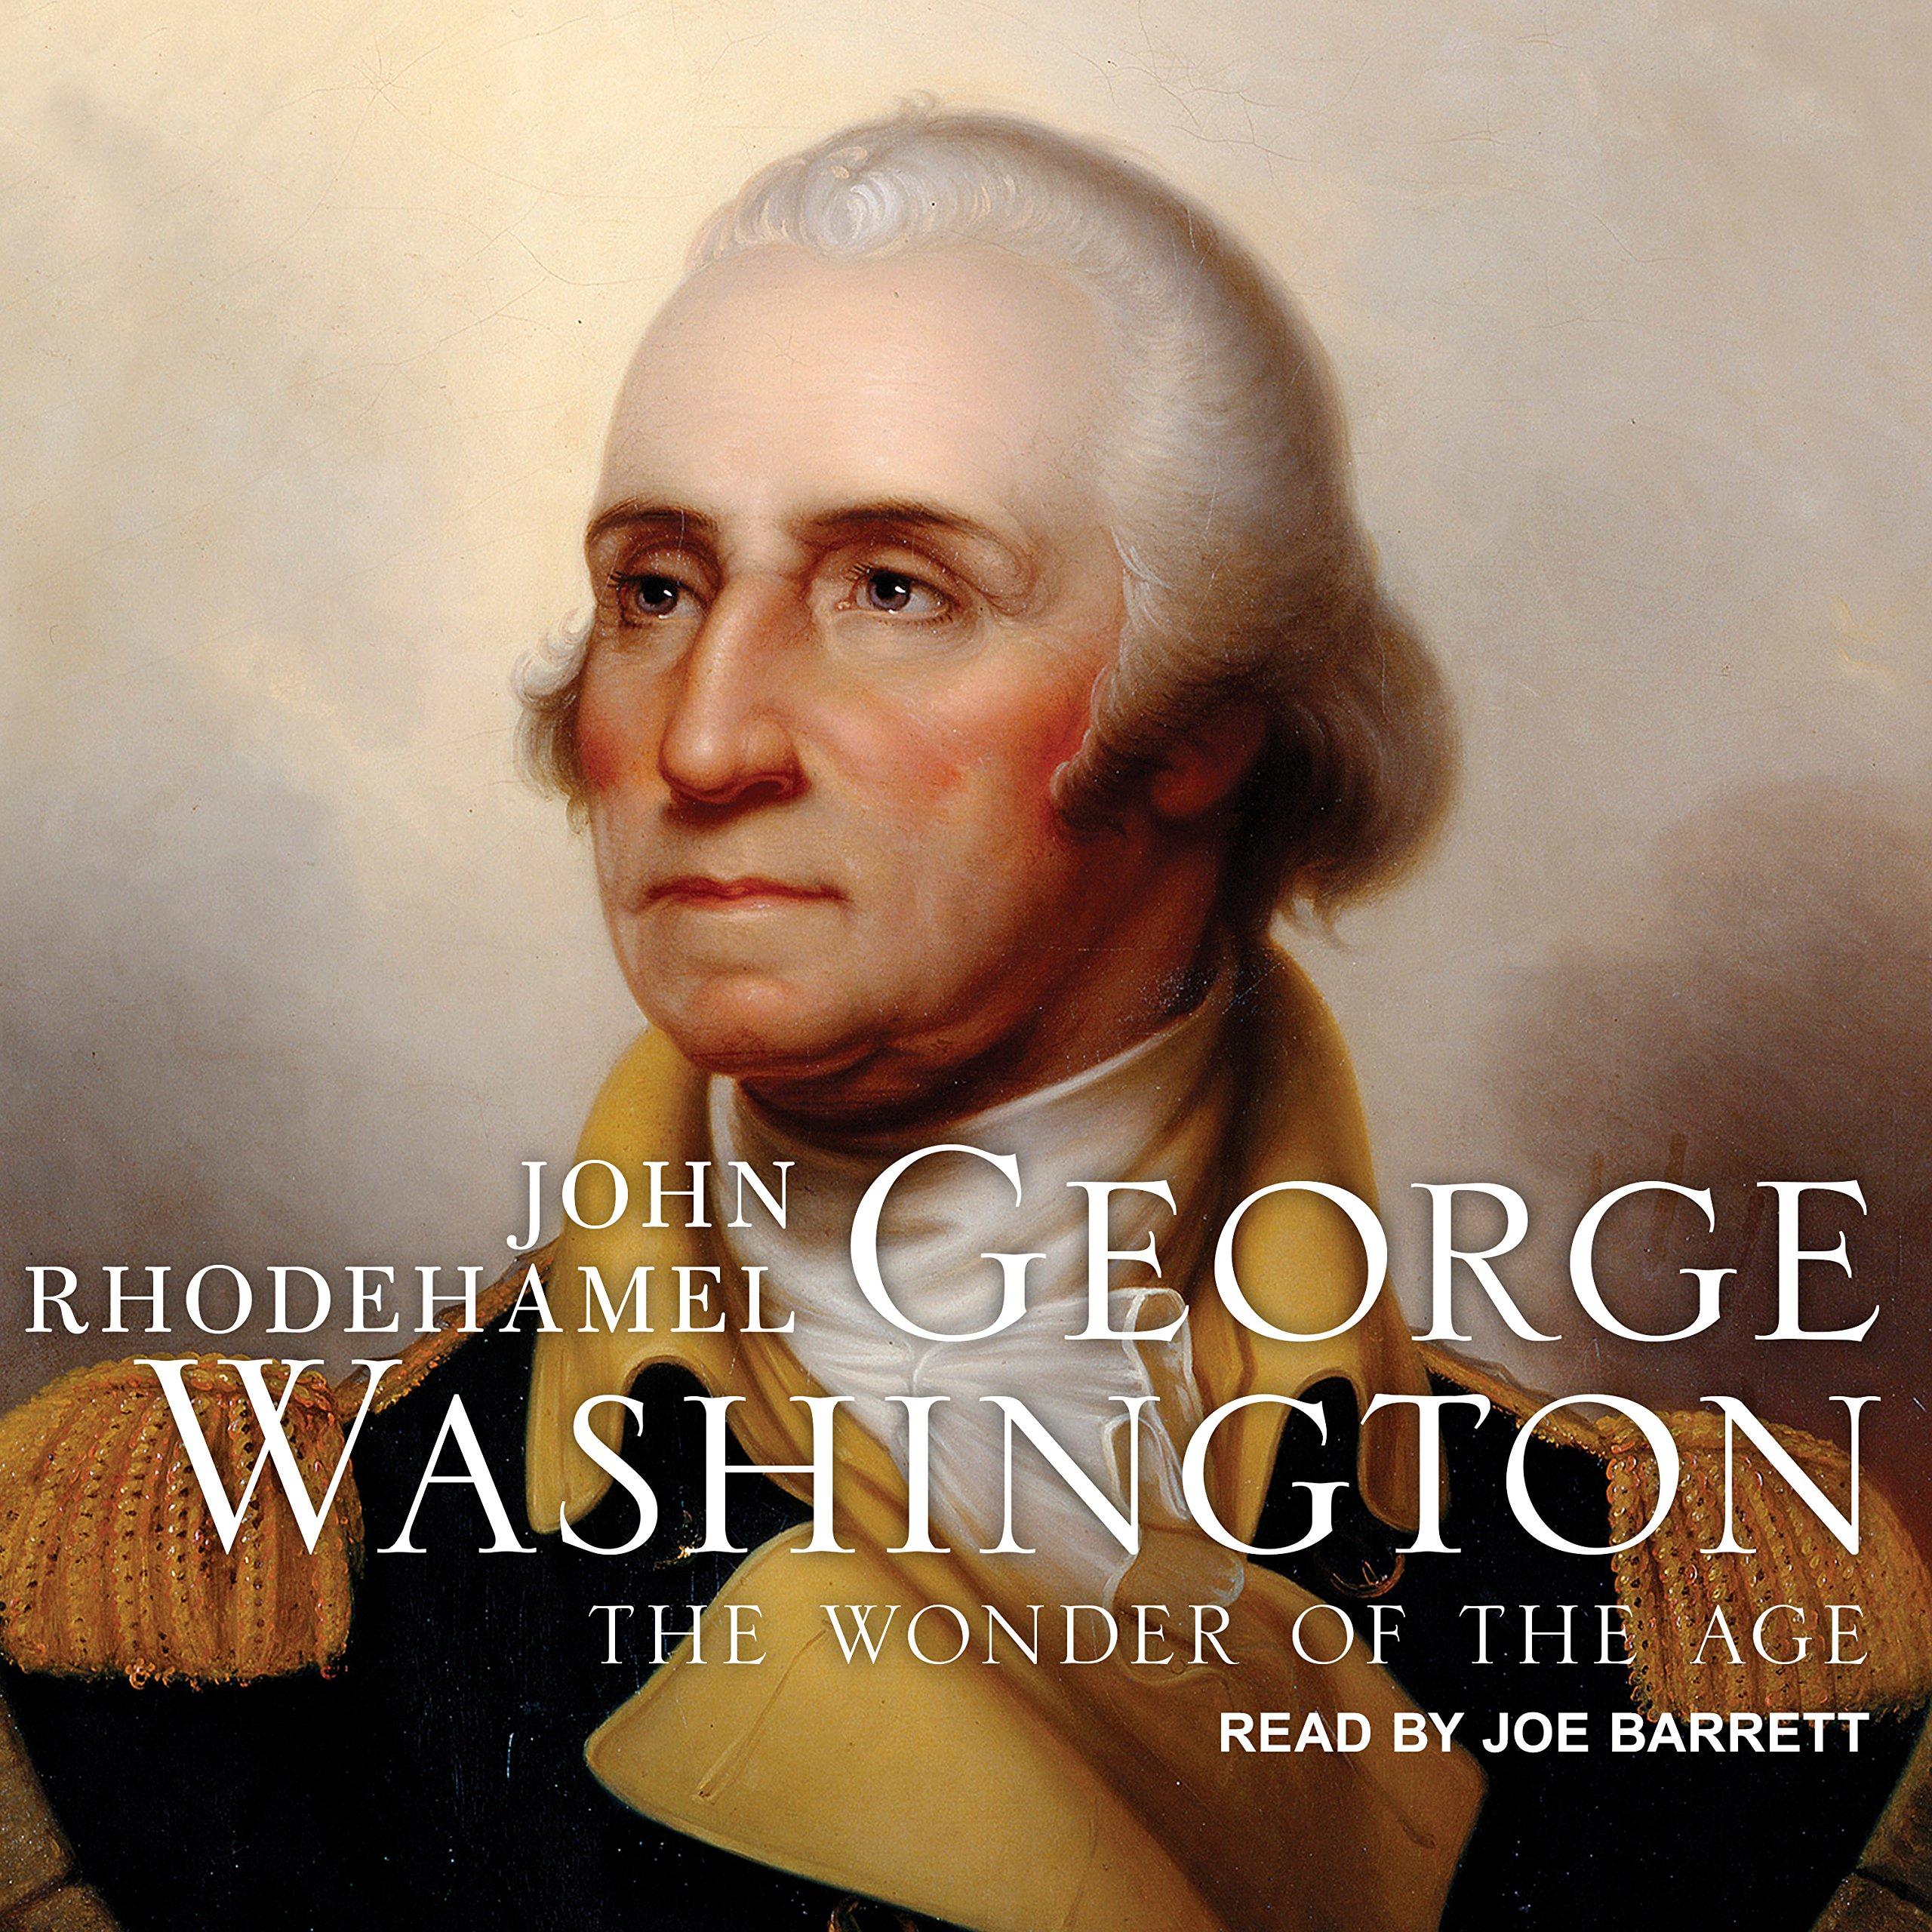 Amazon: George Washington: The Wonder Of The Age (9781515967316): John  Rhodehamel, Joe Barrett: Books